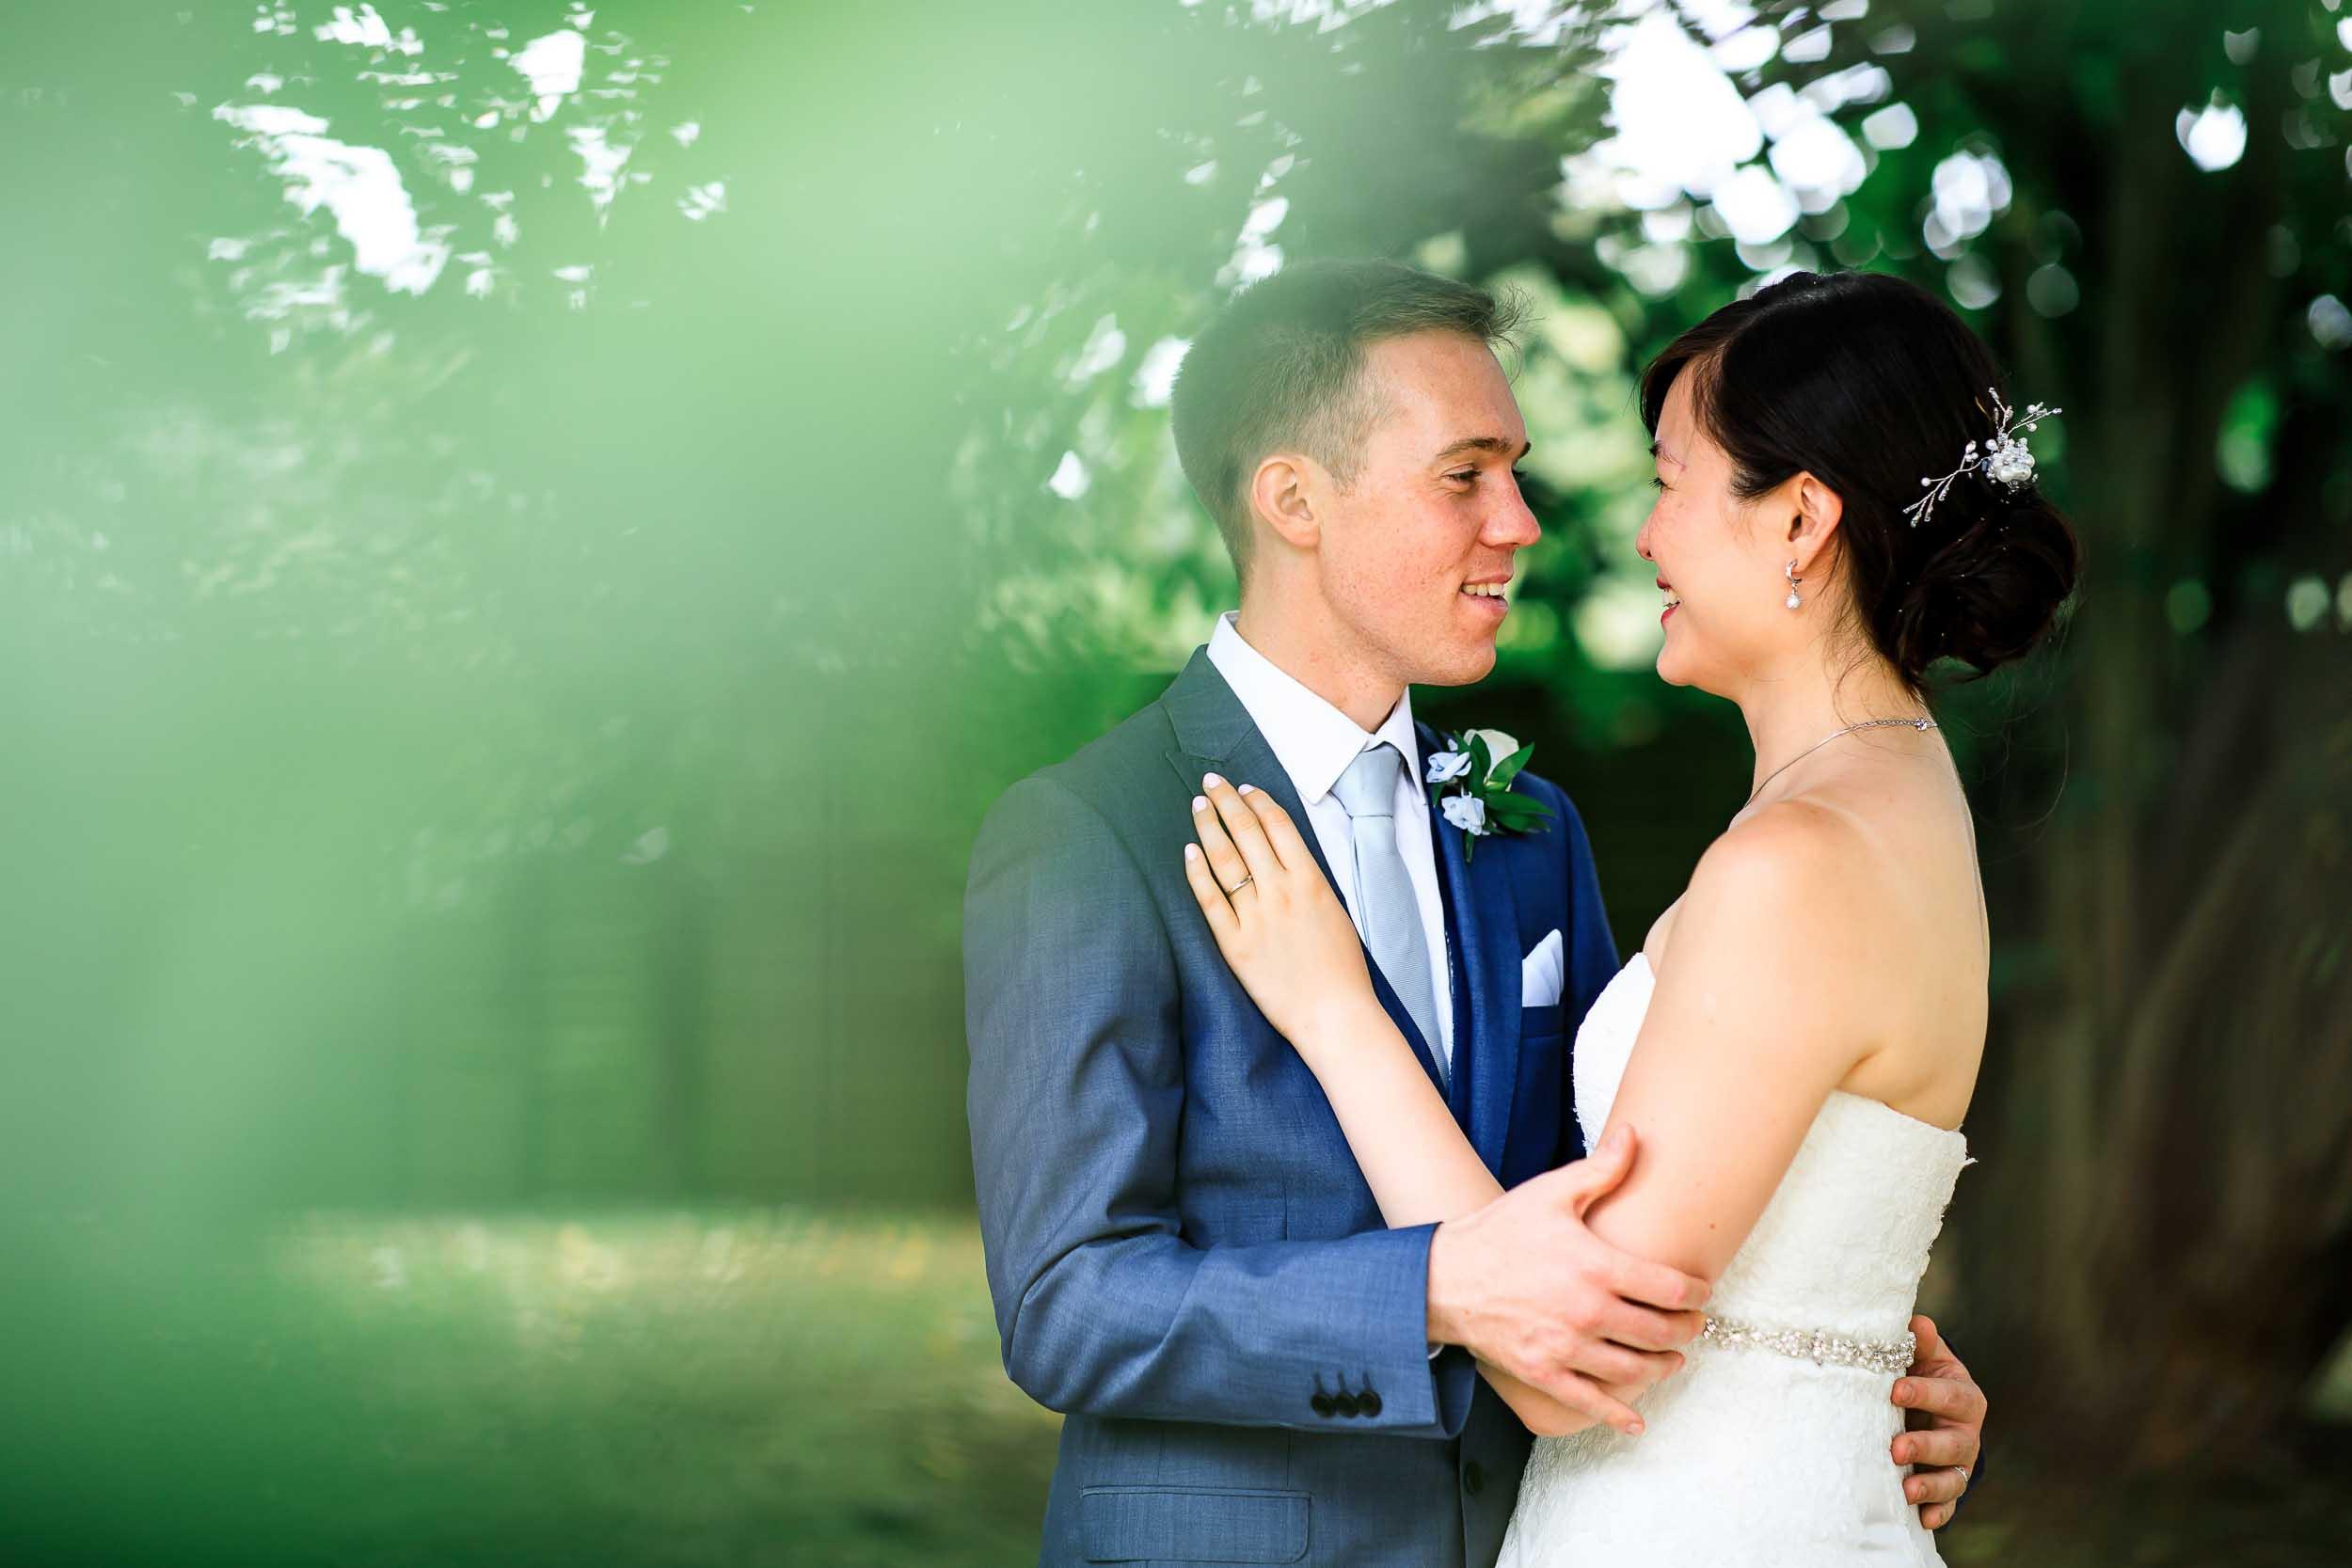 Stanbrook, abbey, Wedding, Photographer, Herefordshire, Worcestershire, Stanbrook Abbey, Wedding Photographer, Stanbrook Abbey Wedding Photographer,